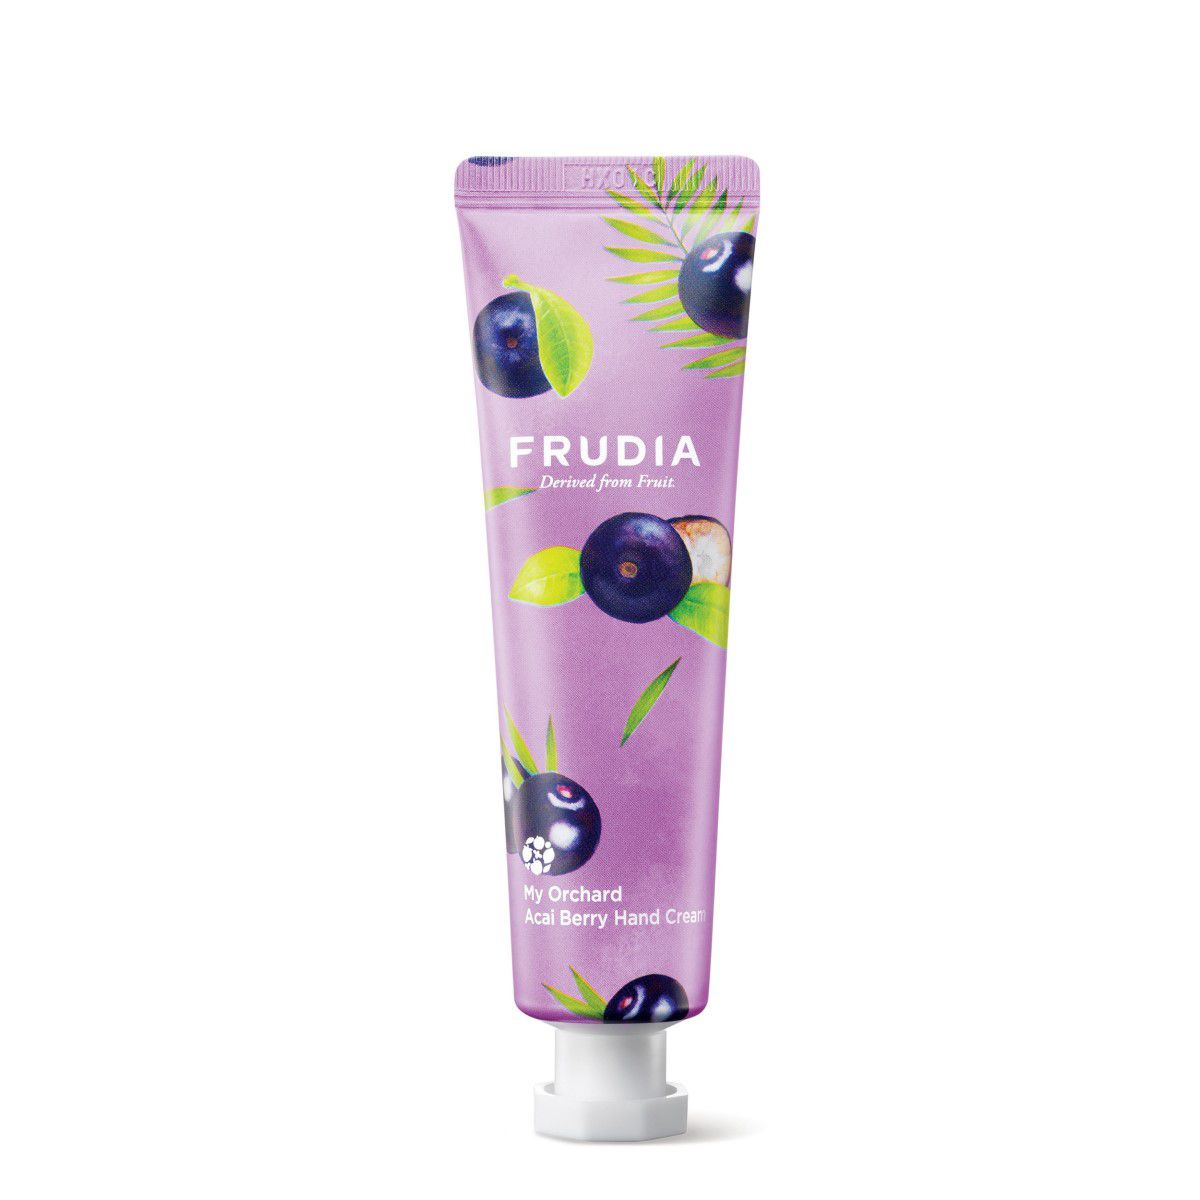 FRUDIA My Orchard Acai Berry Hand Creamのバリエーション1